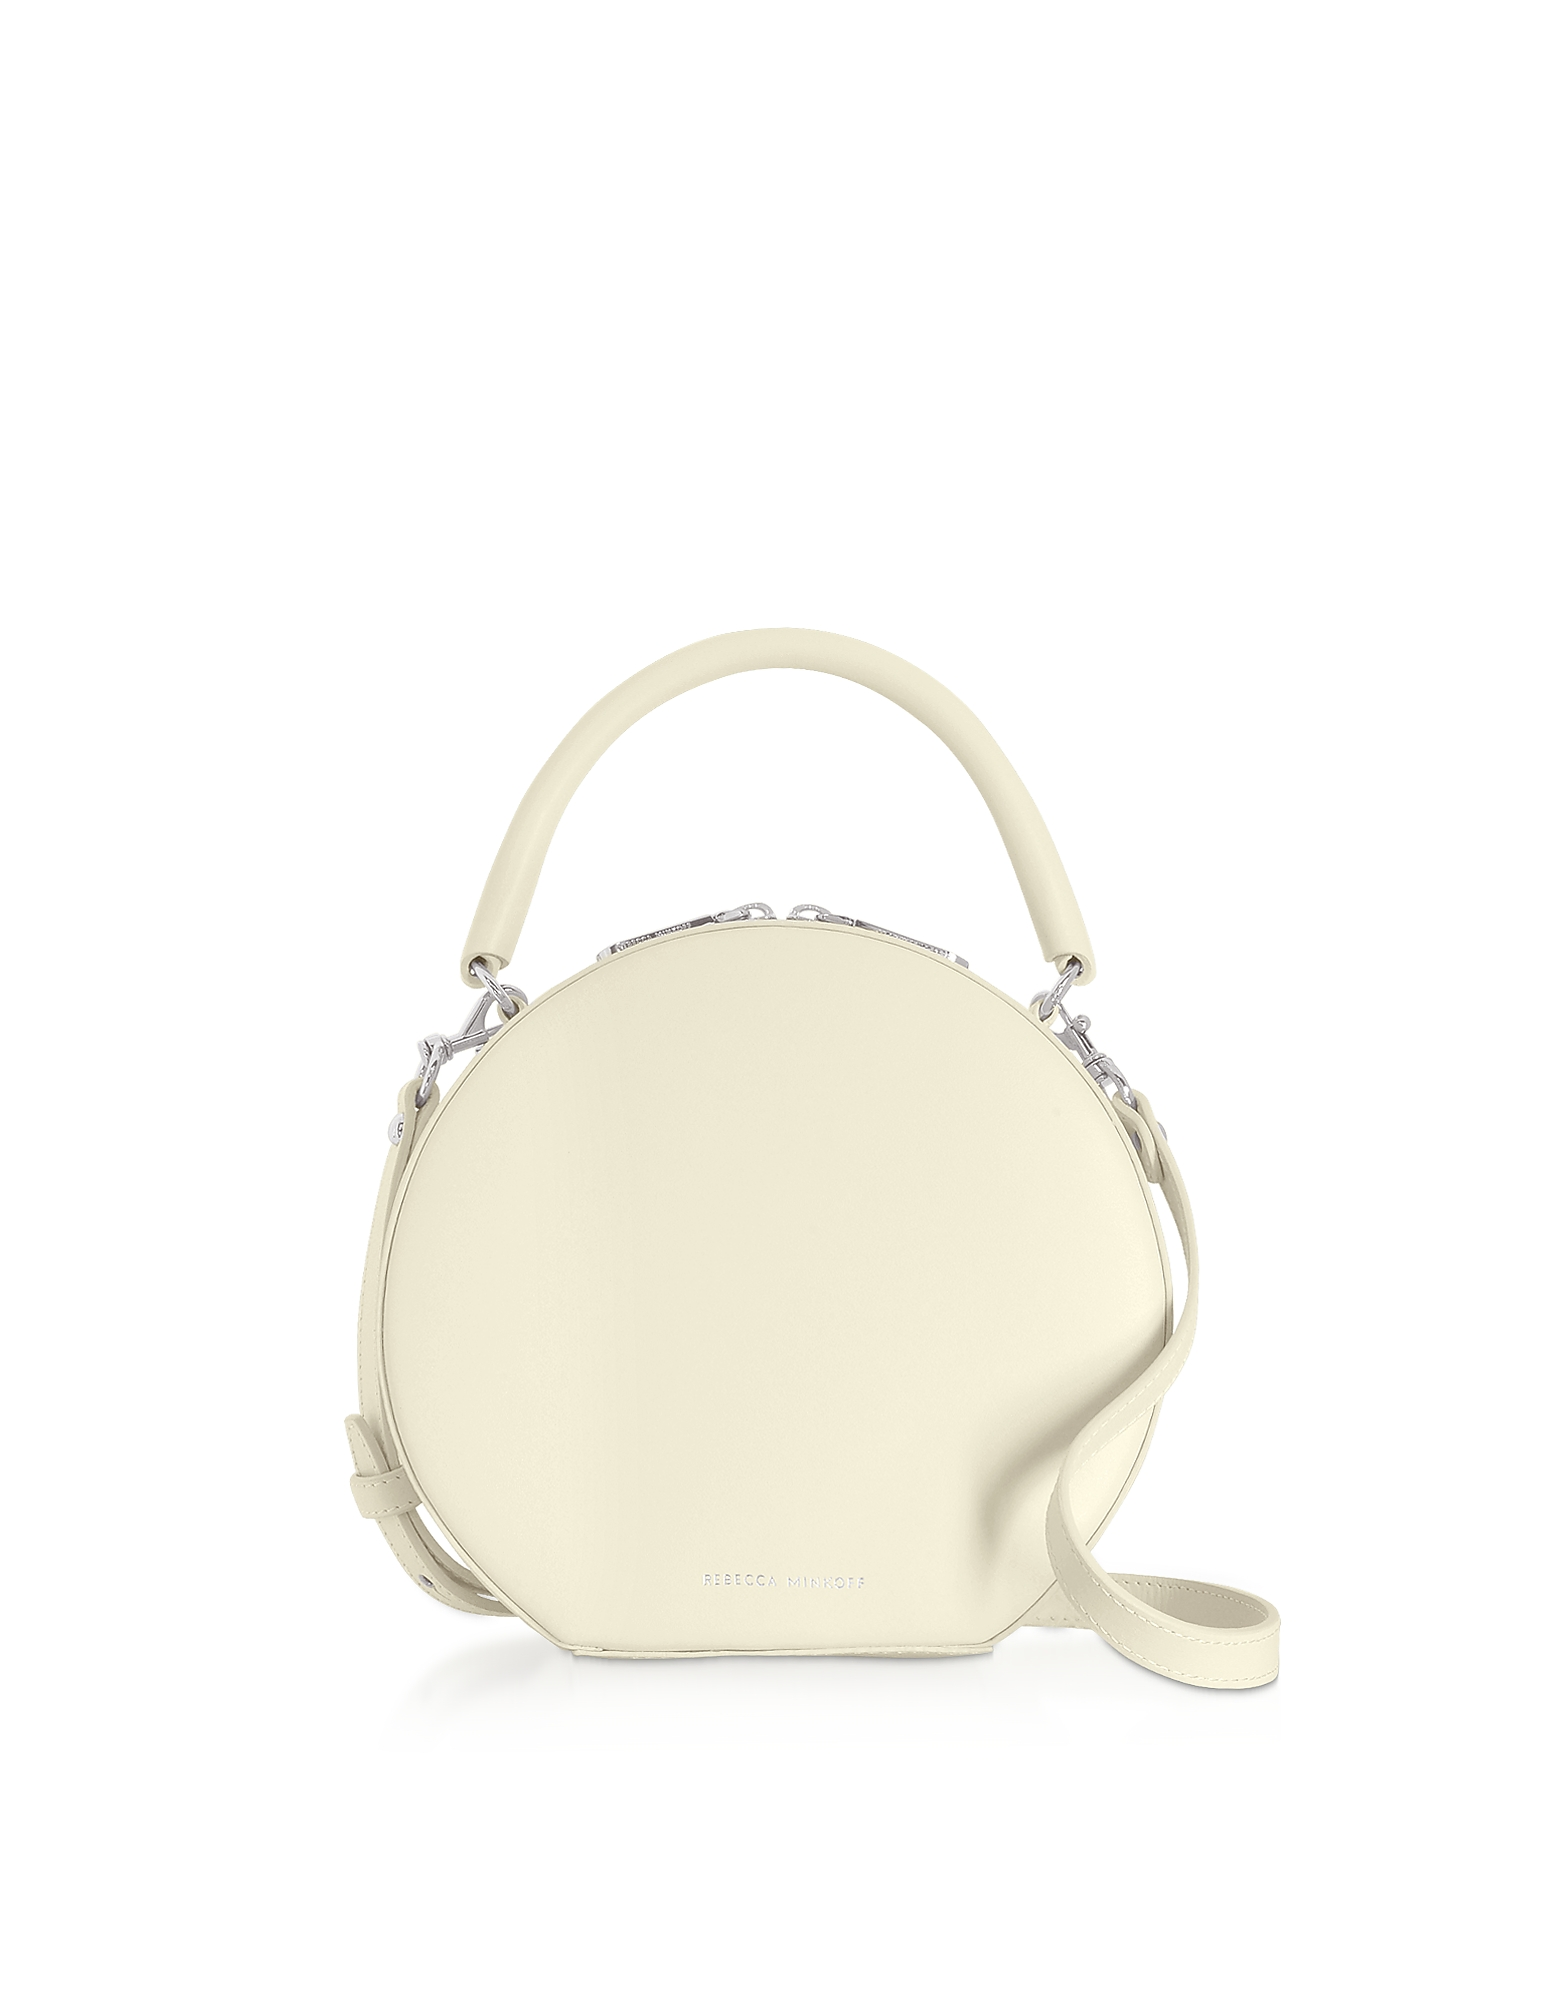 Rebecca Minkoff Designer Handbags, Nappa Leather Circle Crossbody Bag